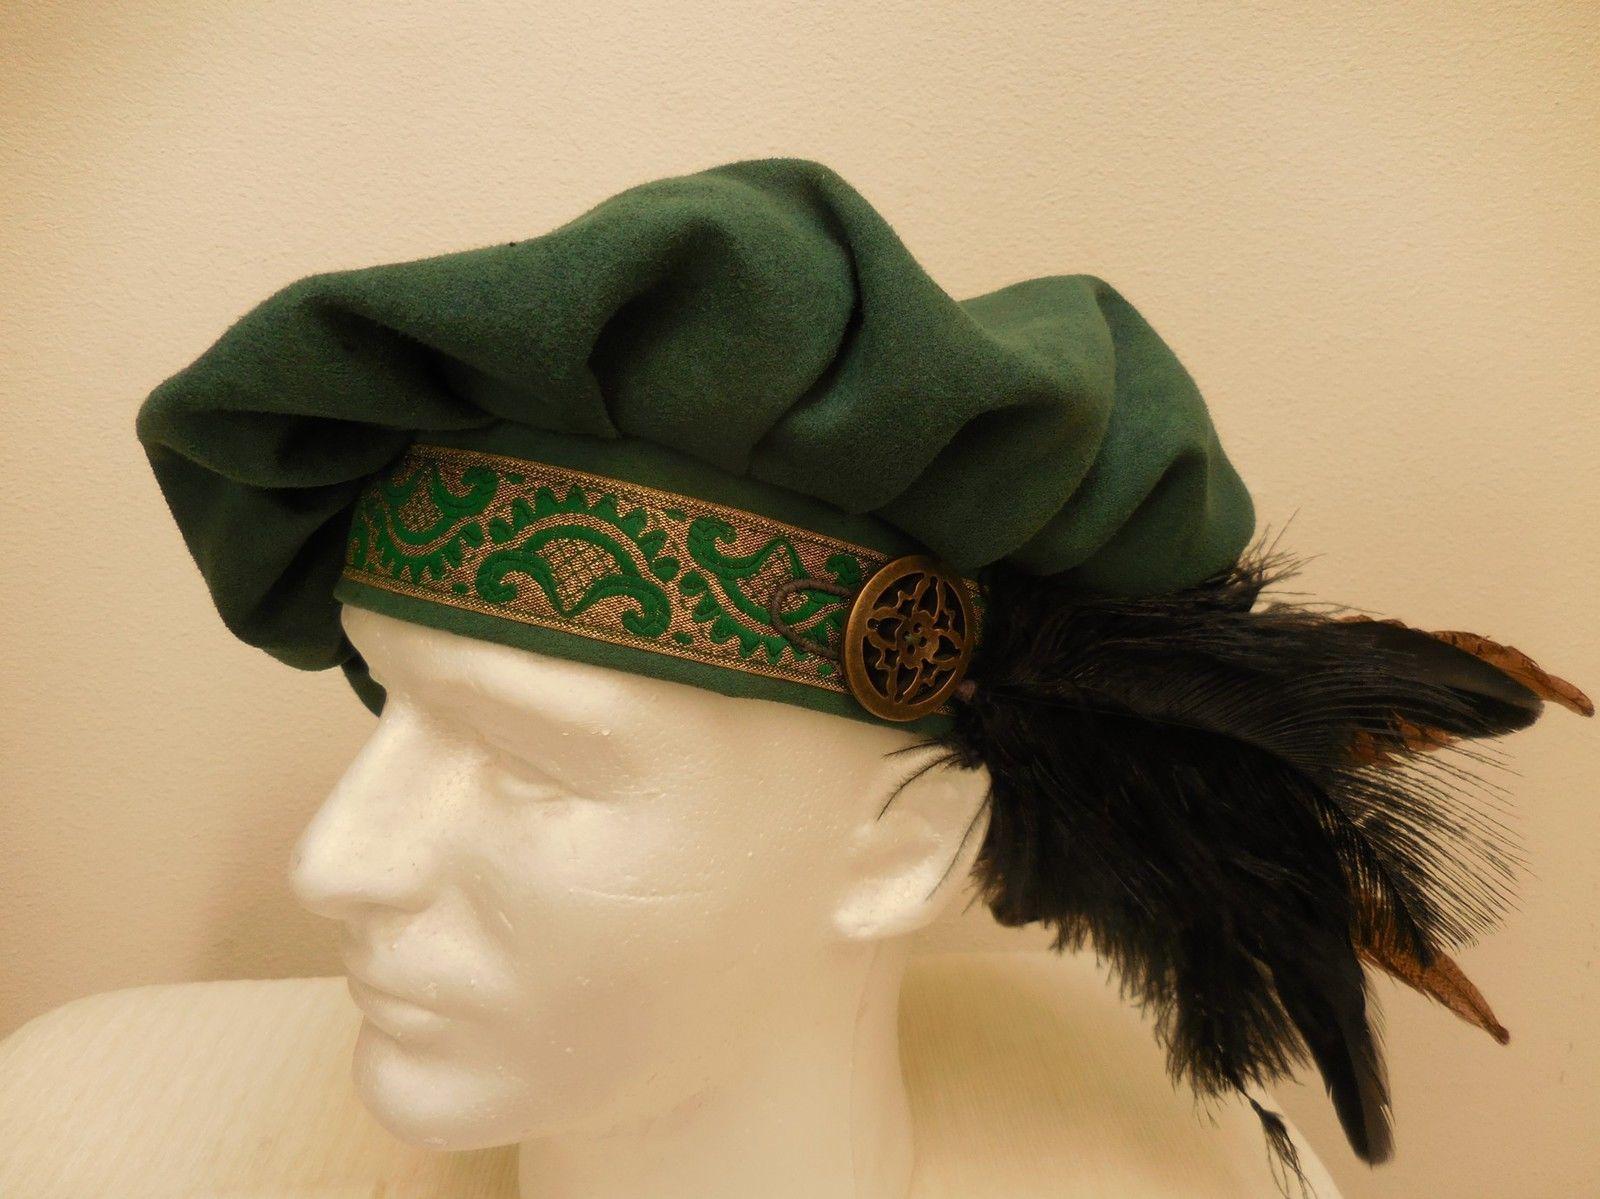 new green renaissance medieval tudor floppy muffin hat cap costume